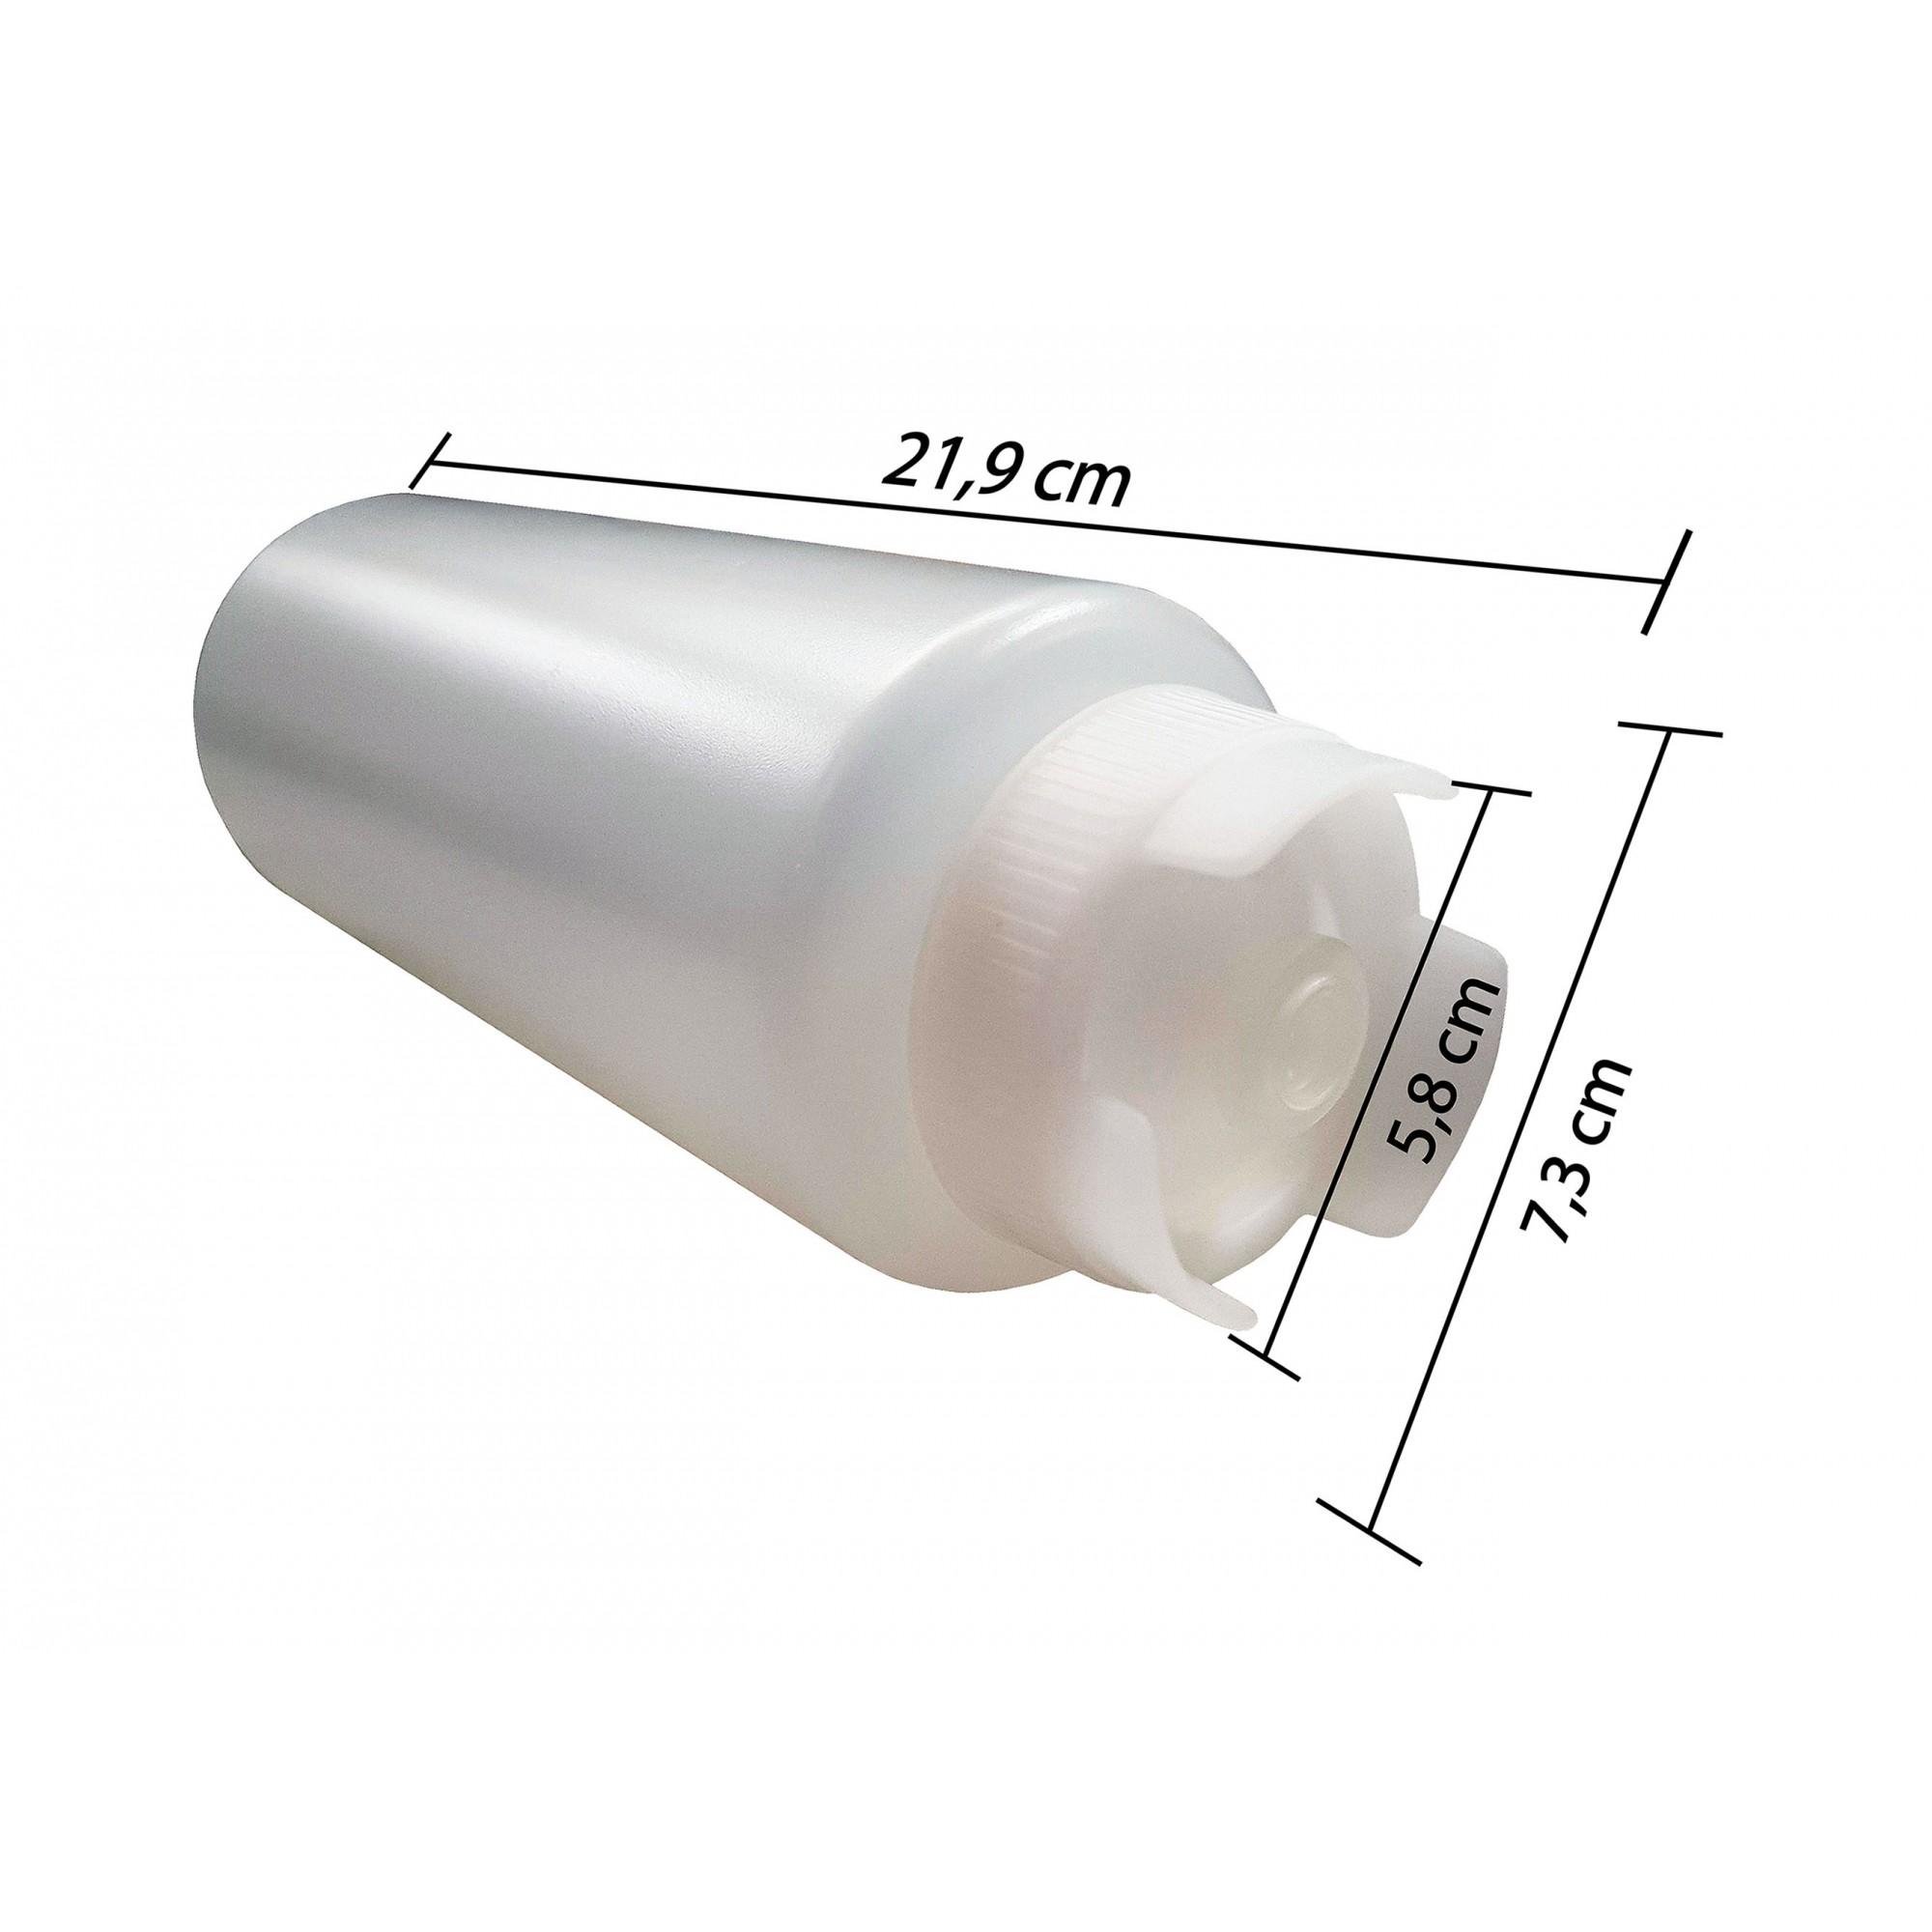 Bisnaga Invertida 720ml  - EKENOX- Equipamentos Industriais